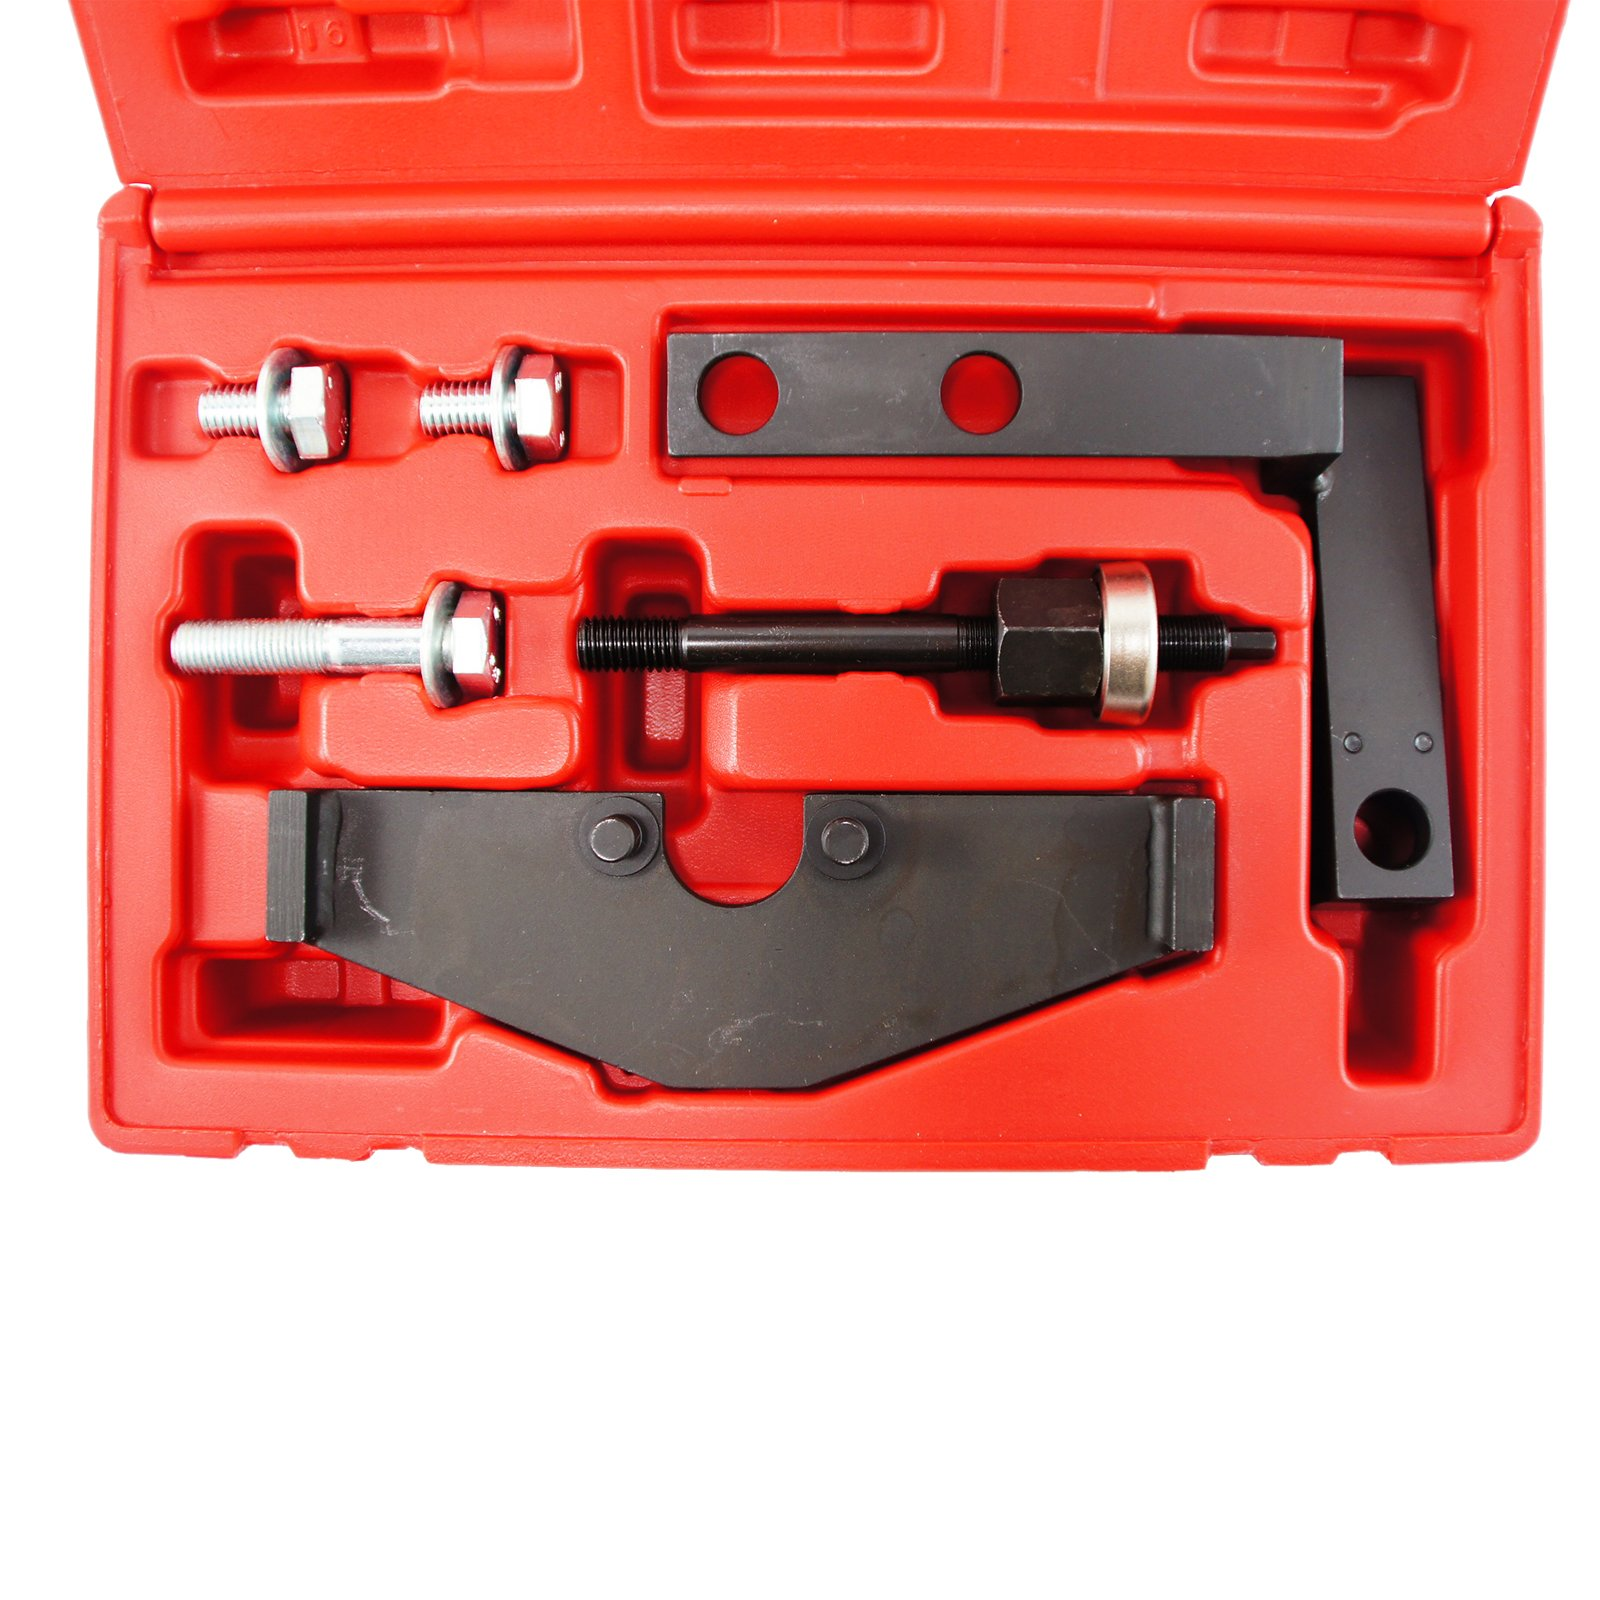 EWK Mini Cooper Bmw W10 W11 V16 Engine Timing Camshaft Cam Locking Tool 2001-2006 by EWK (Image #1)